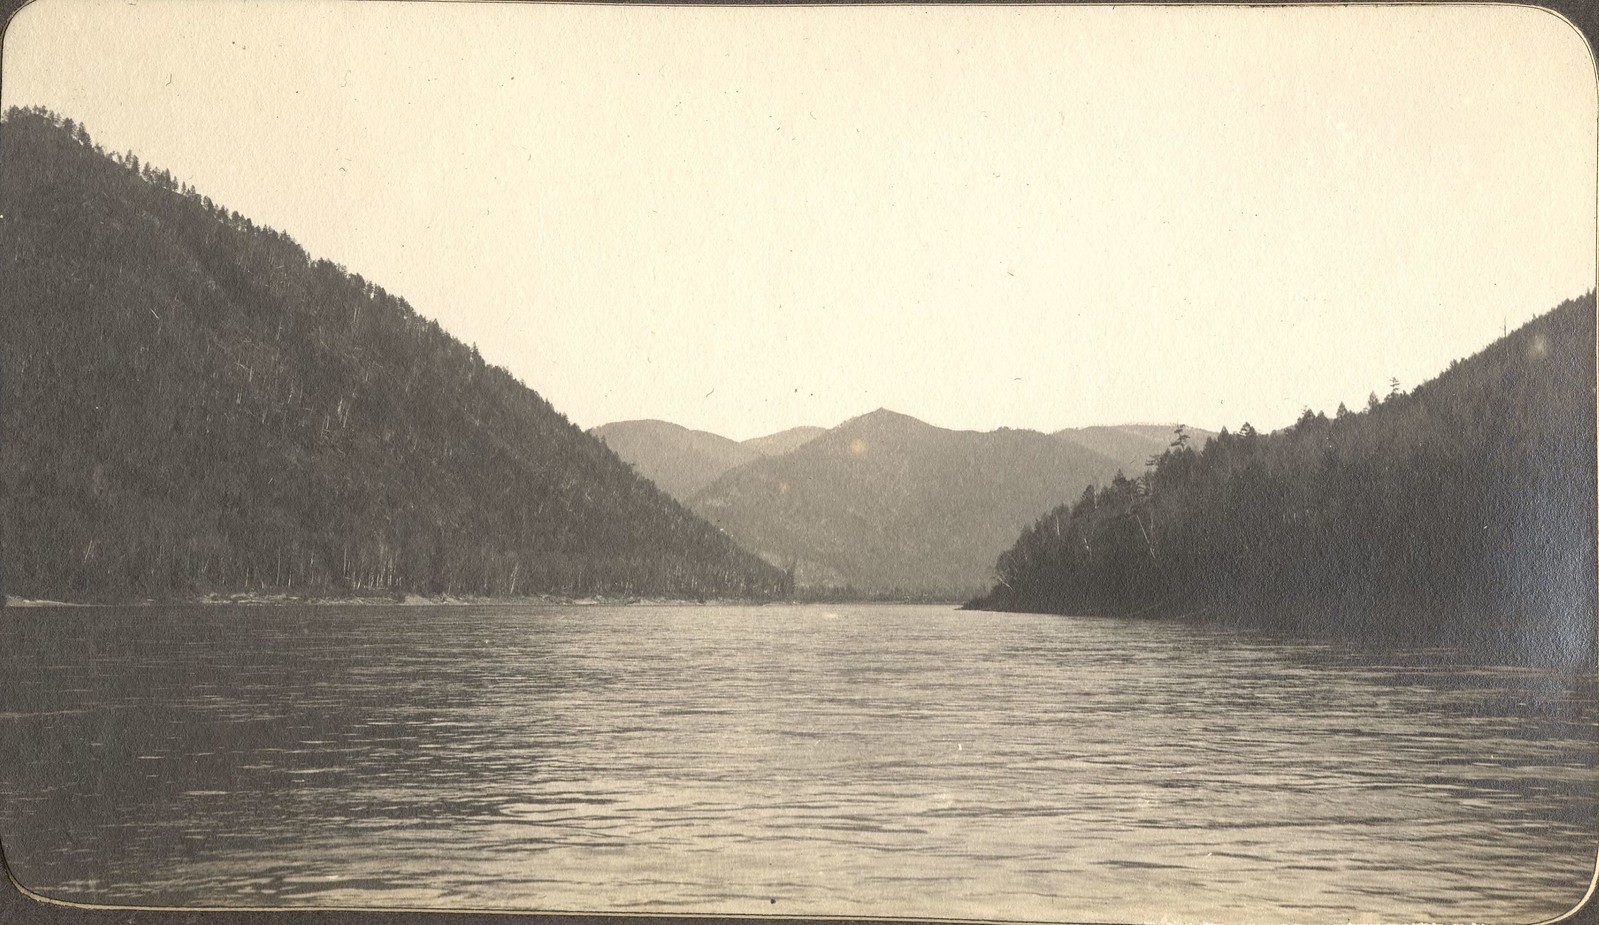 Вид реки Зеи в теснинах гор близ устья Гилюя